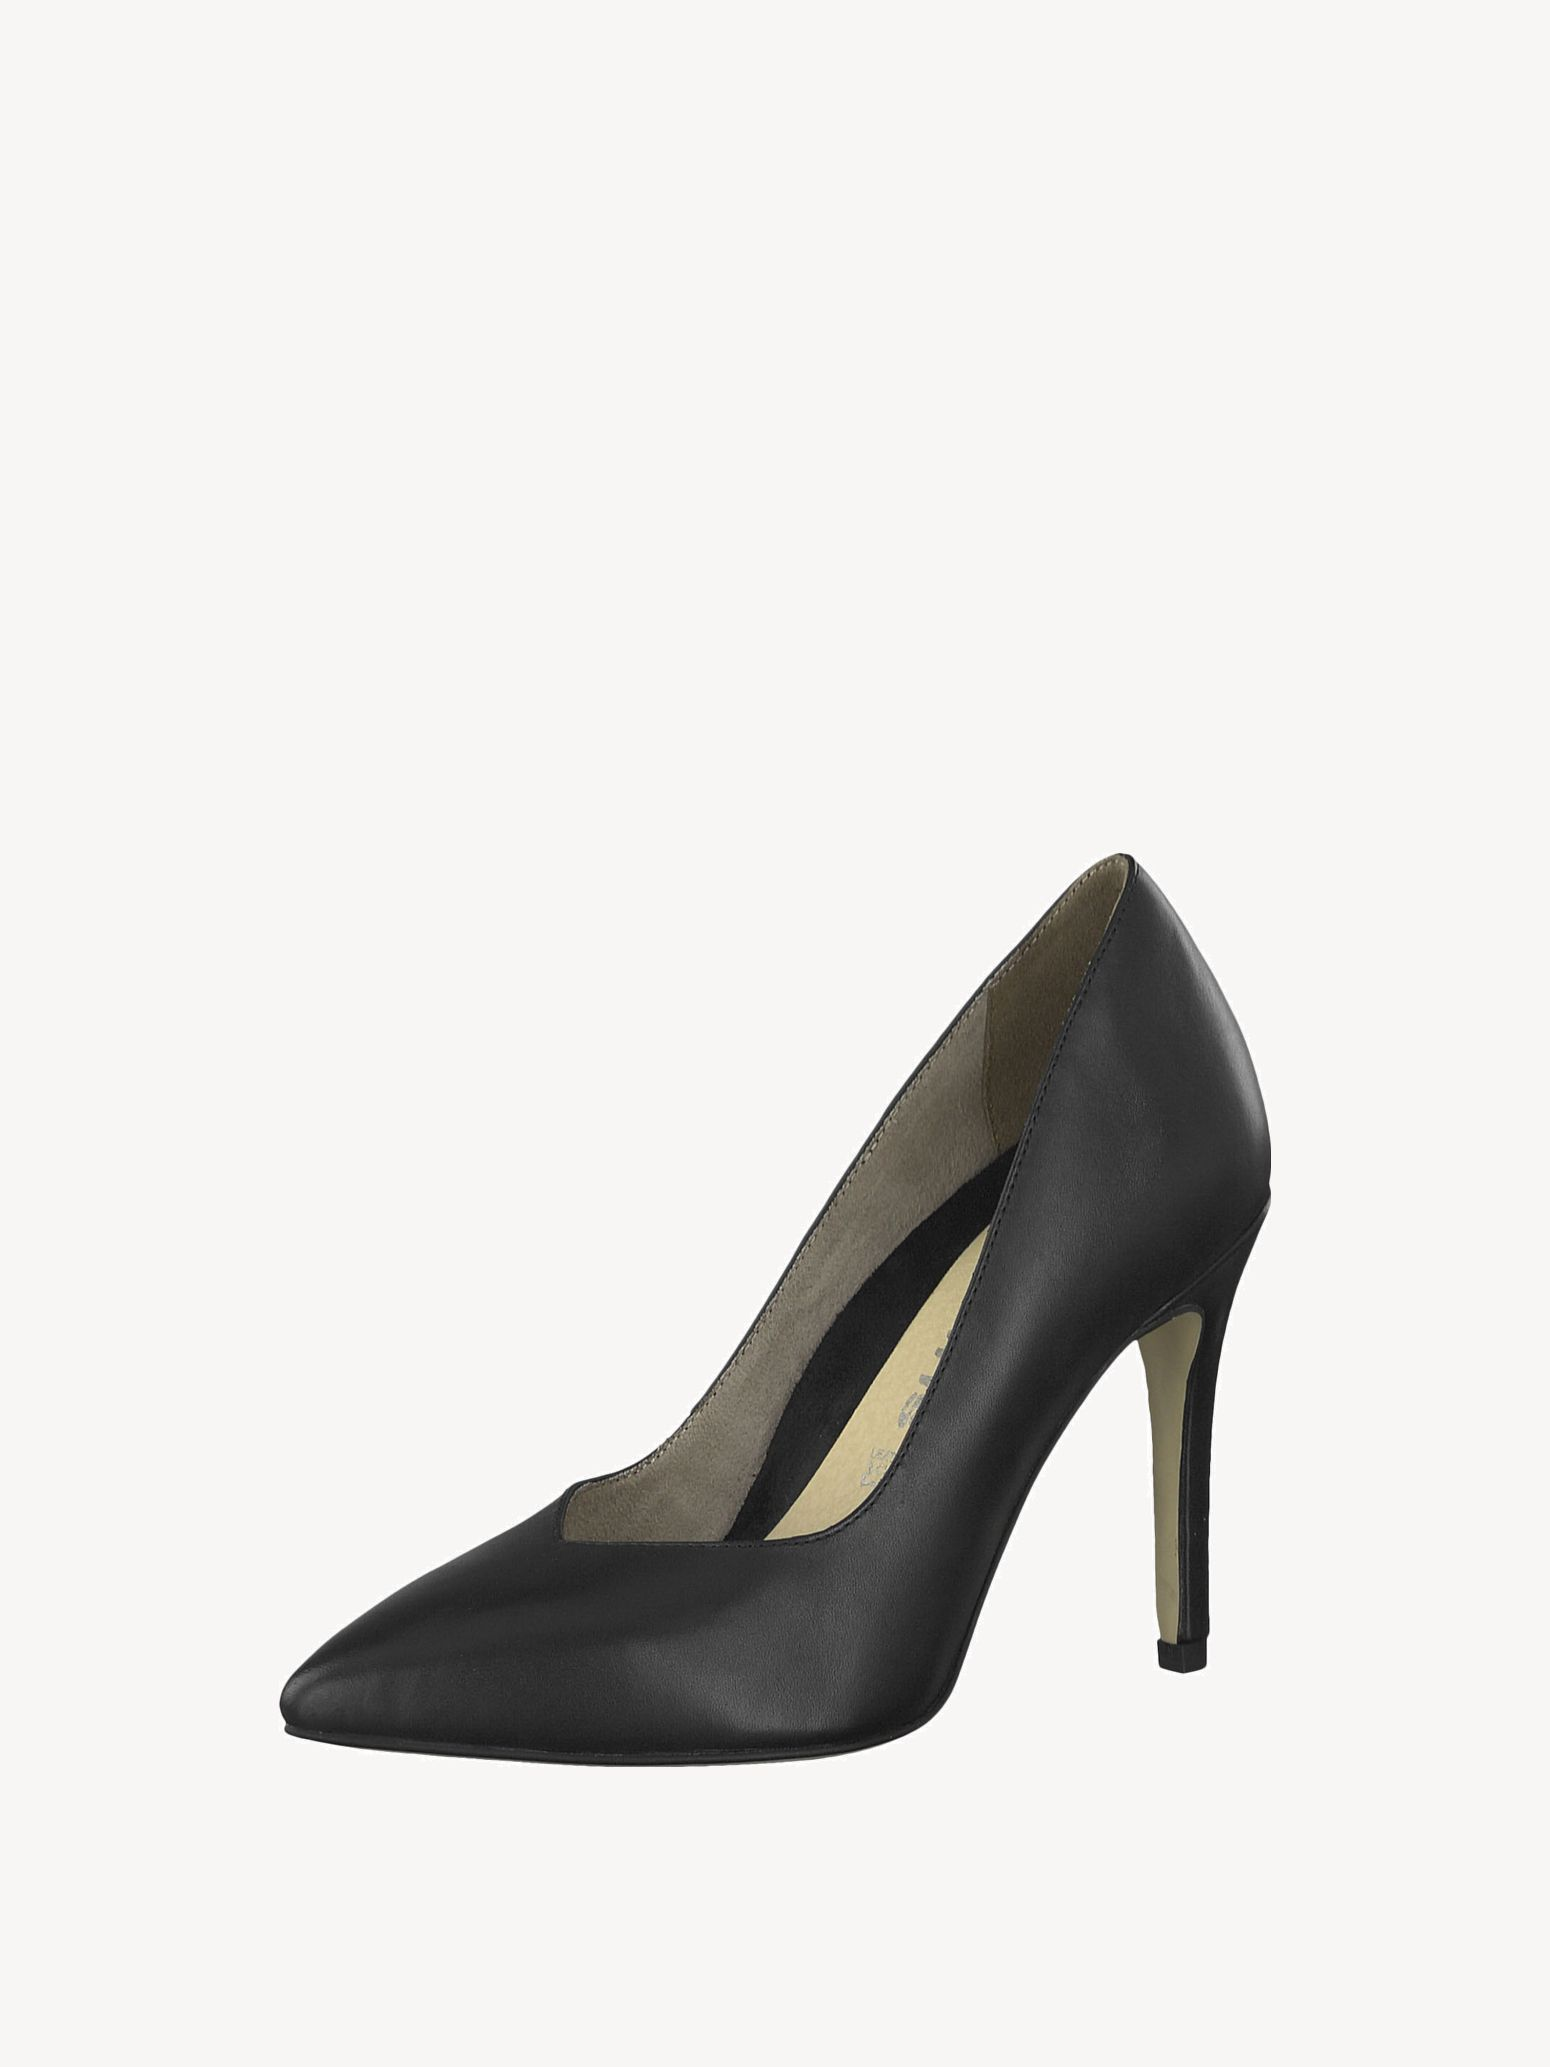 a3db38f8bd9 Idony 1-1-22443-22  Buy Tamaris High heels online!